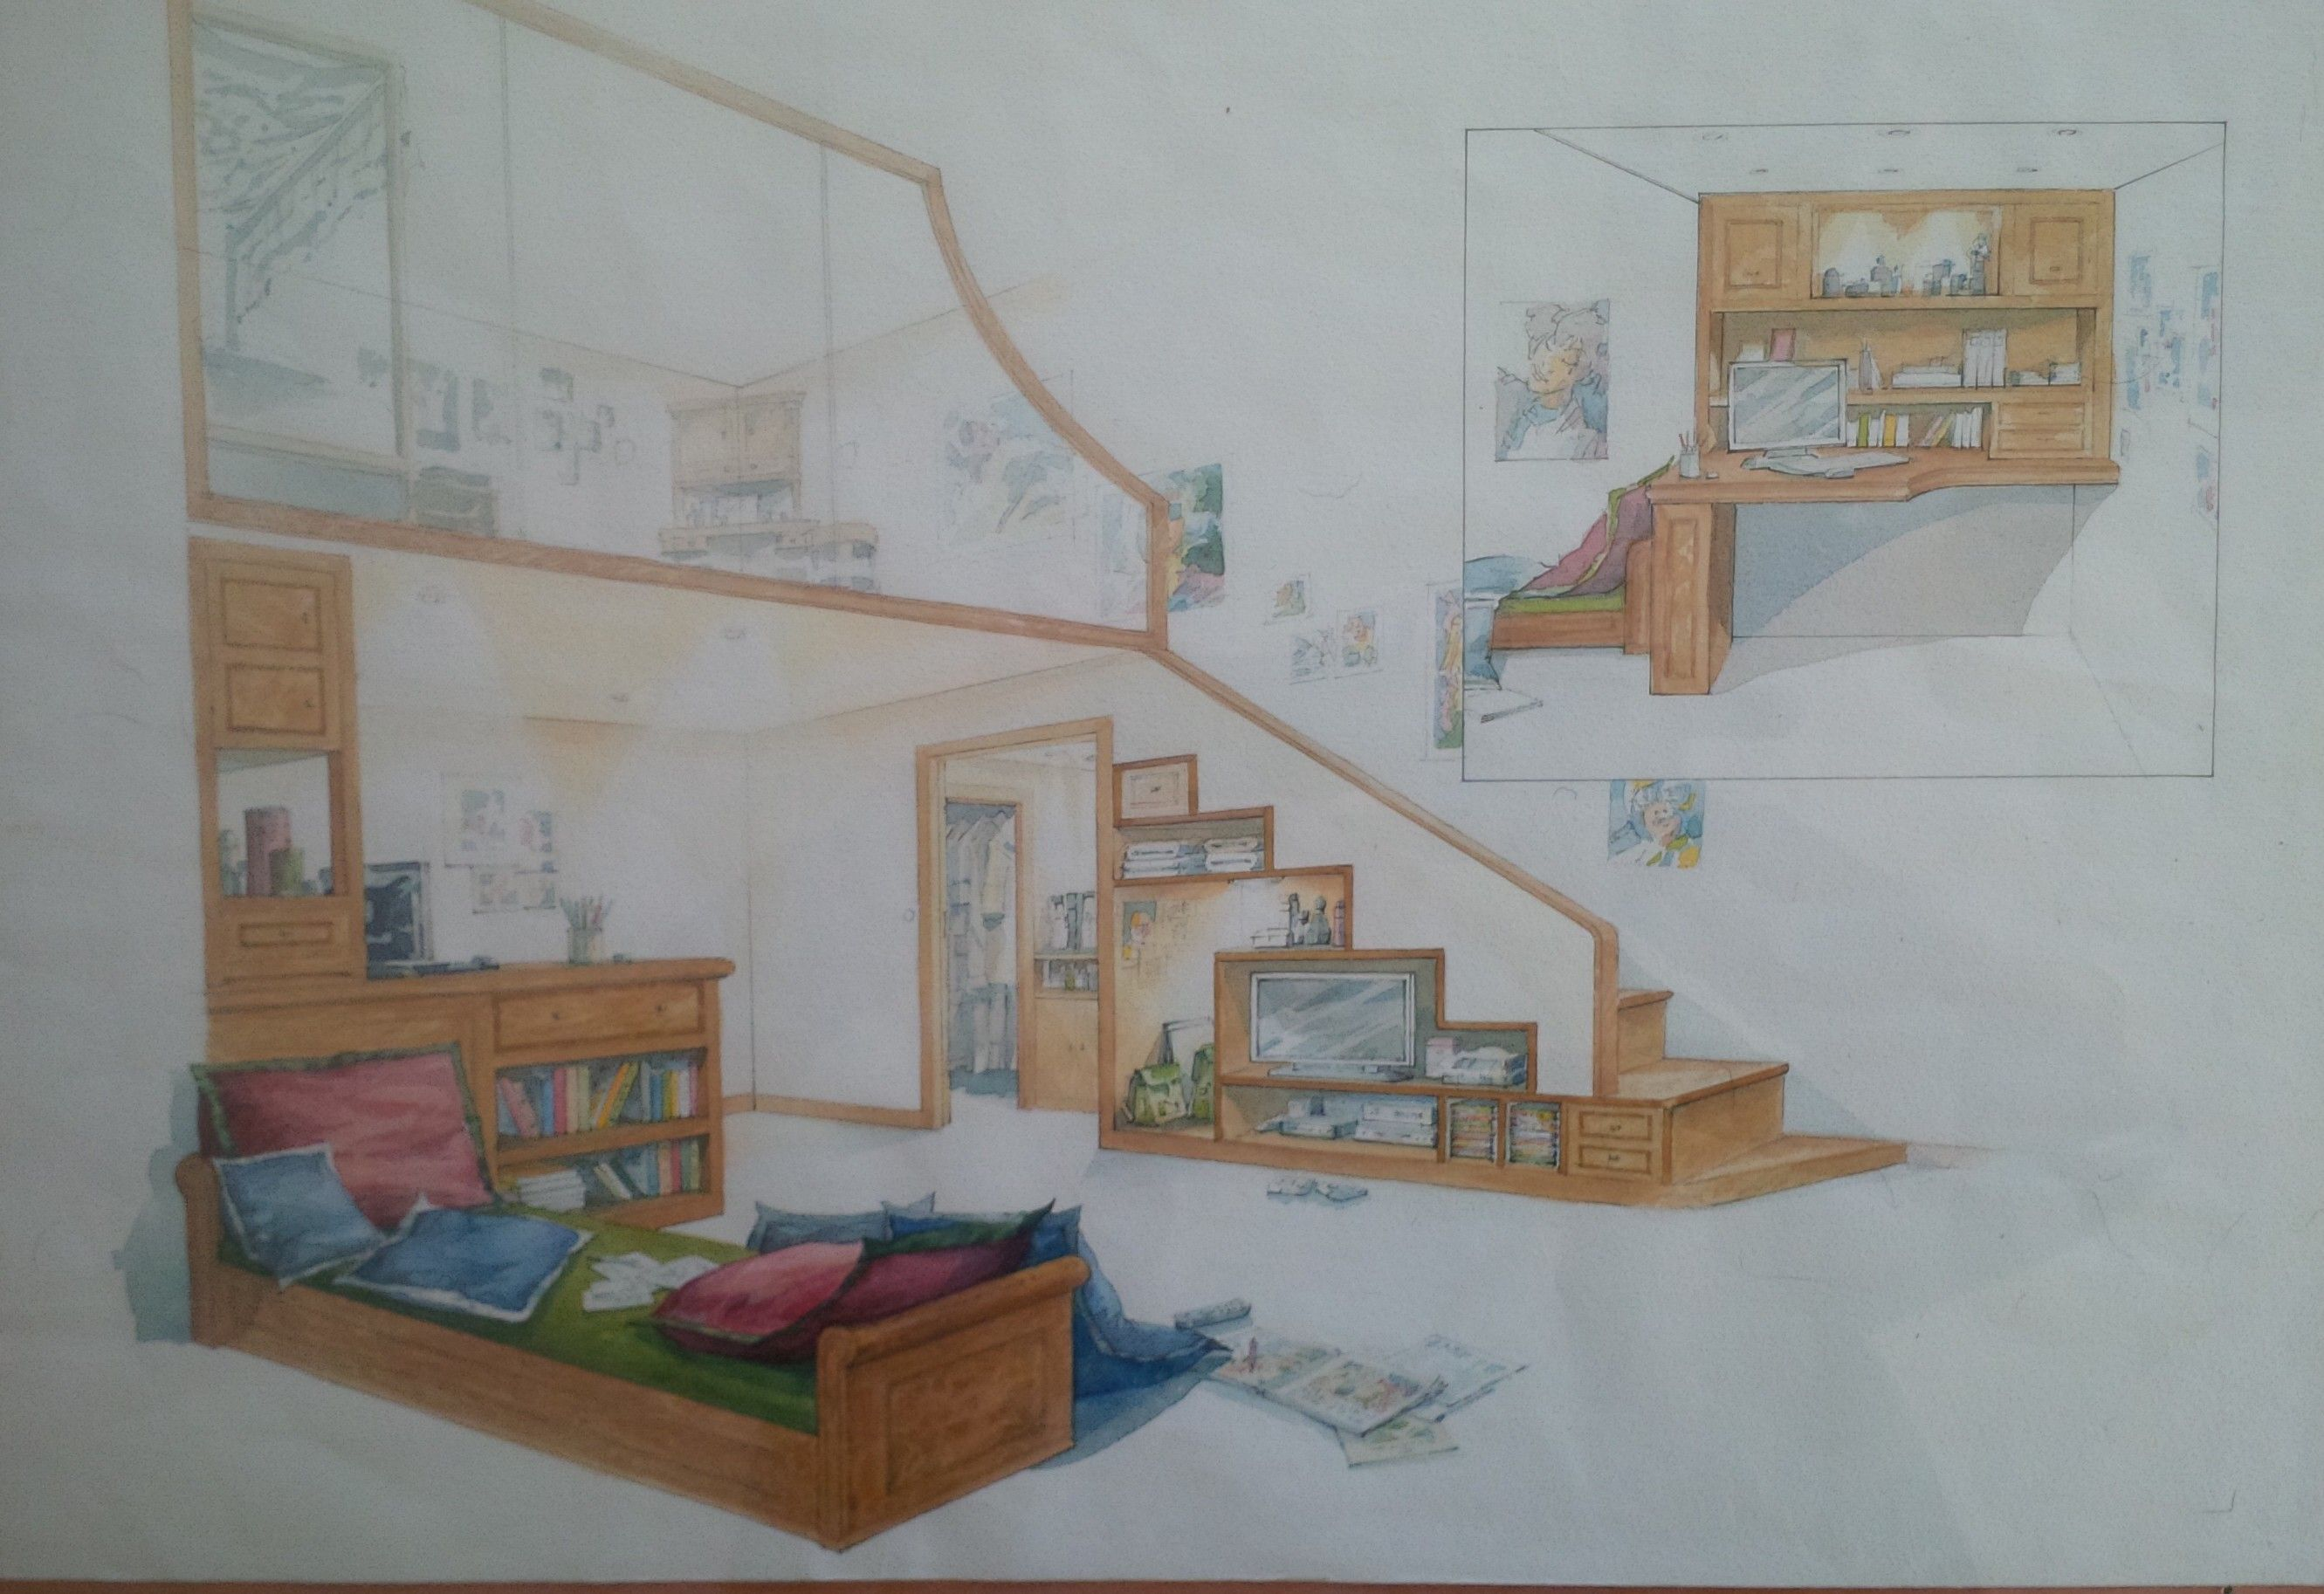 Mezzanine Sleeping Area sketch for teenagers room, inc day bed study area, and mezzanine